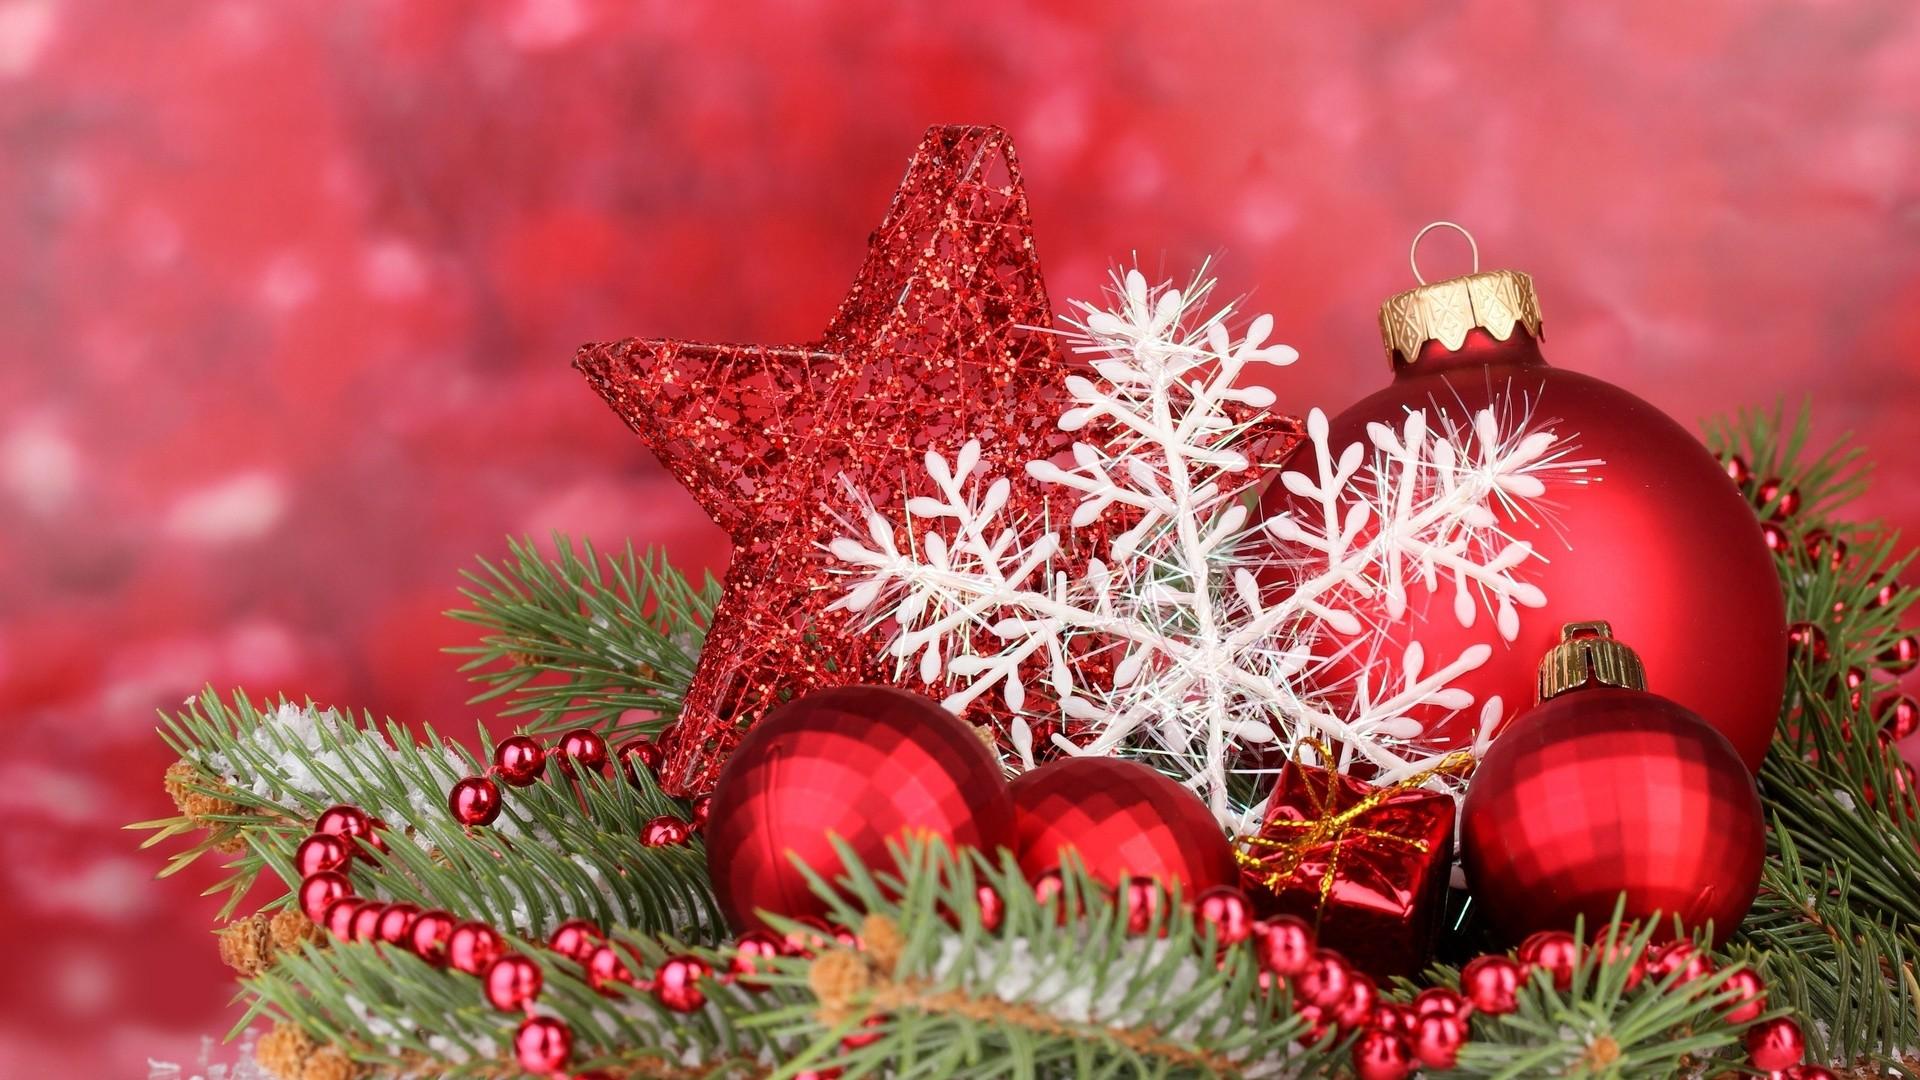 Christmas Desktop Wallpaper (60+ Images